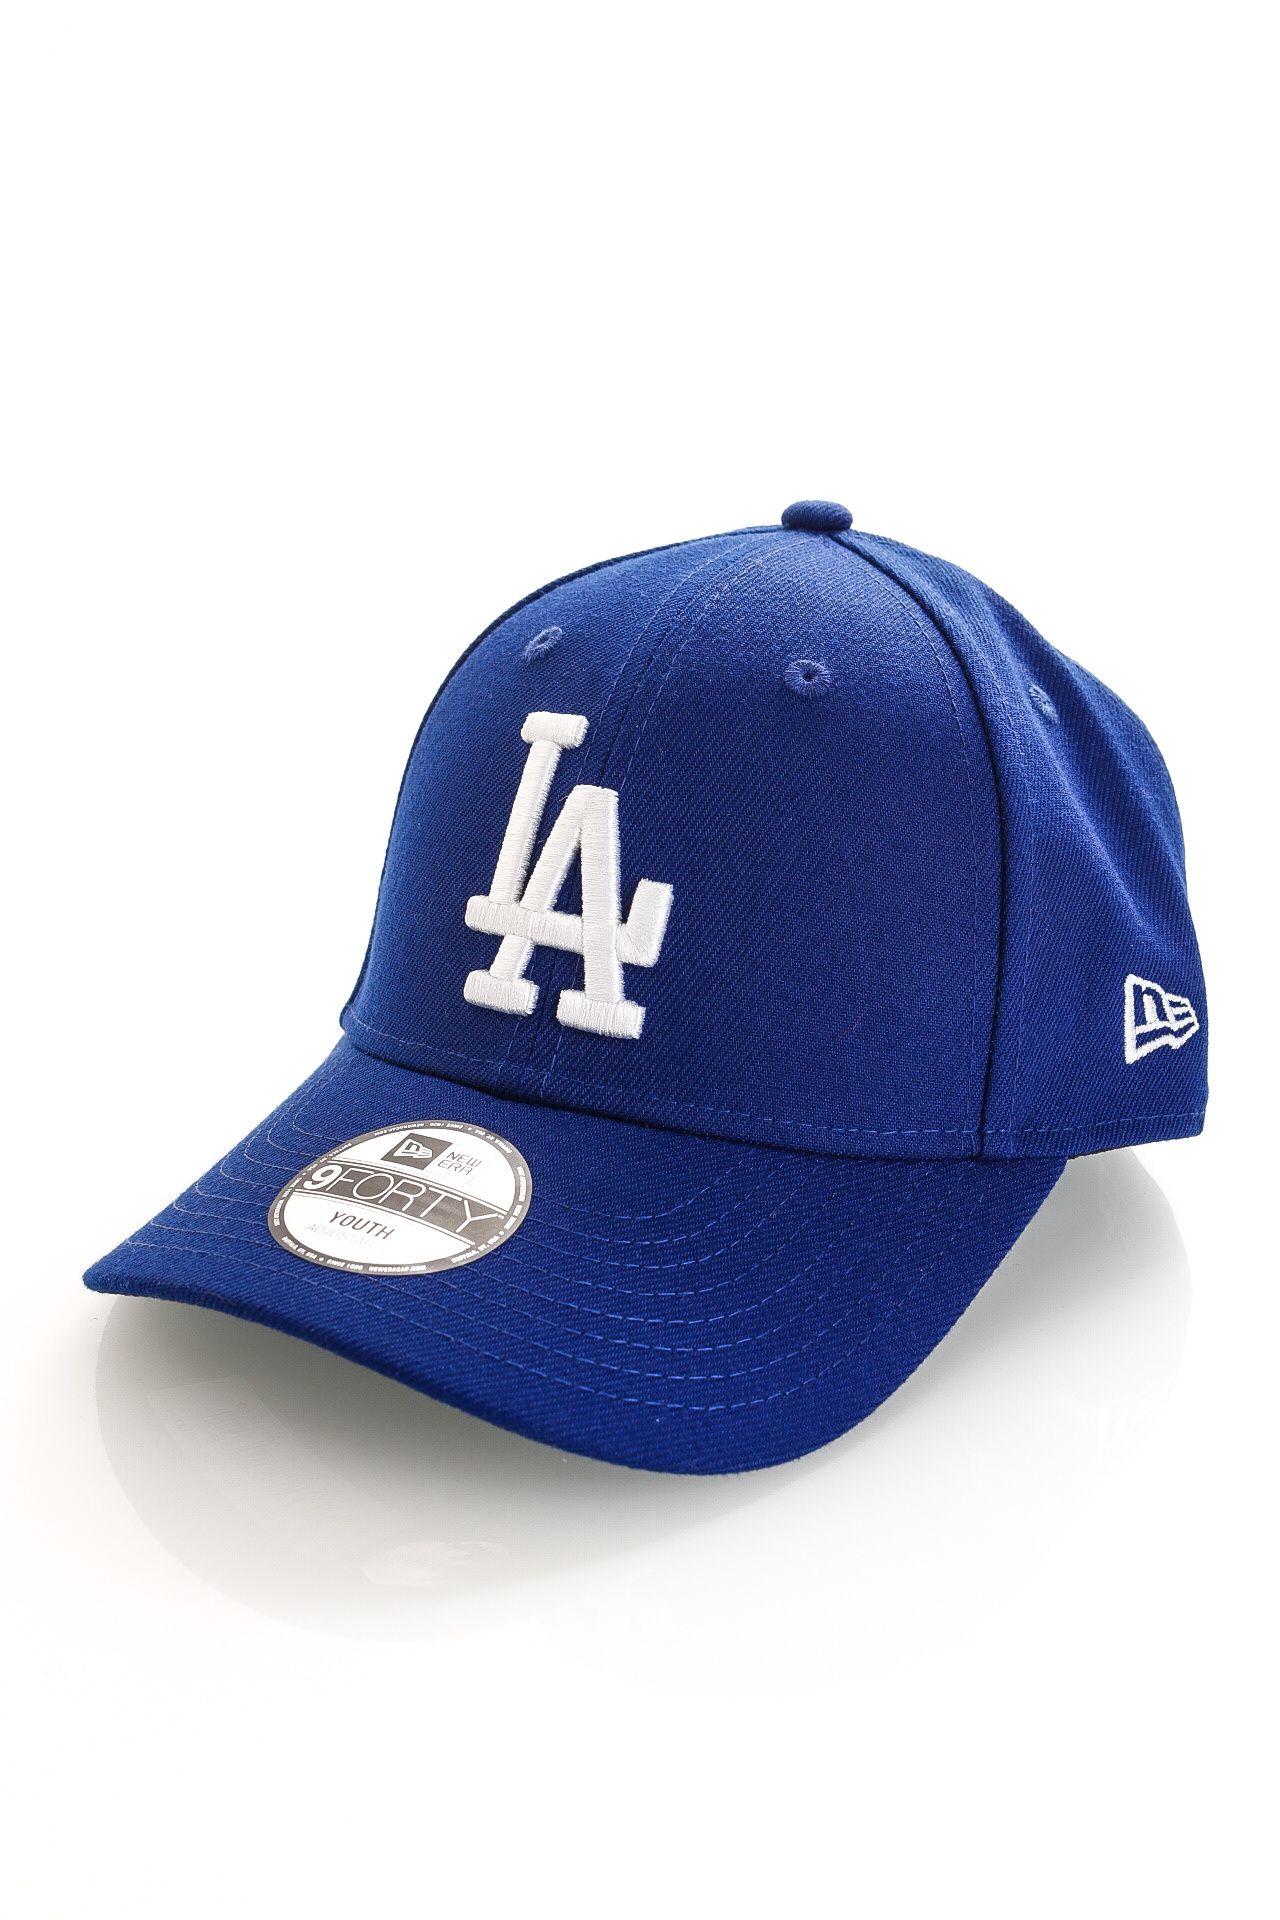 Afbeelding van New Era Dad Cap LOS ANGELES DODGERS KIDS 9FORTY Royal Blue NE60141550